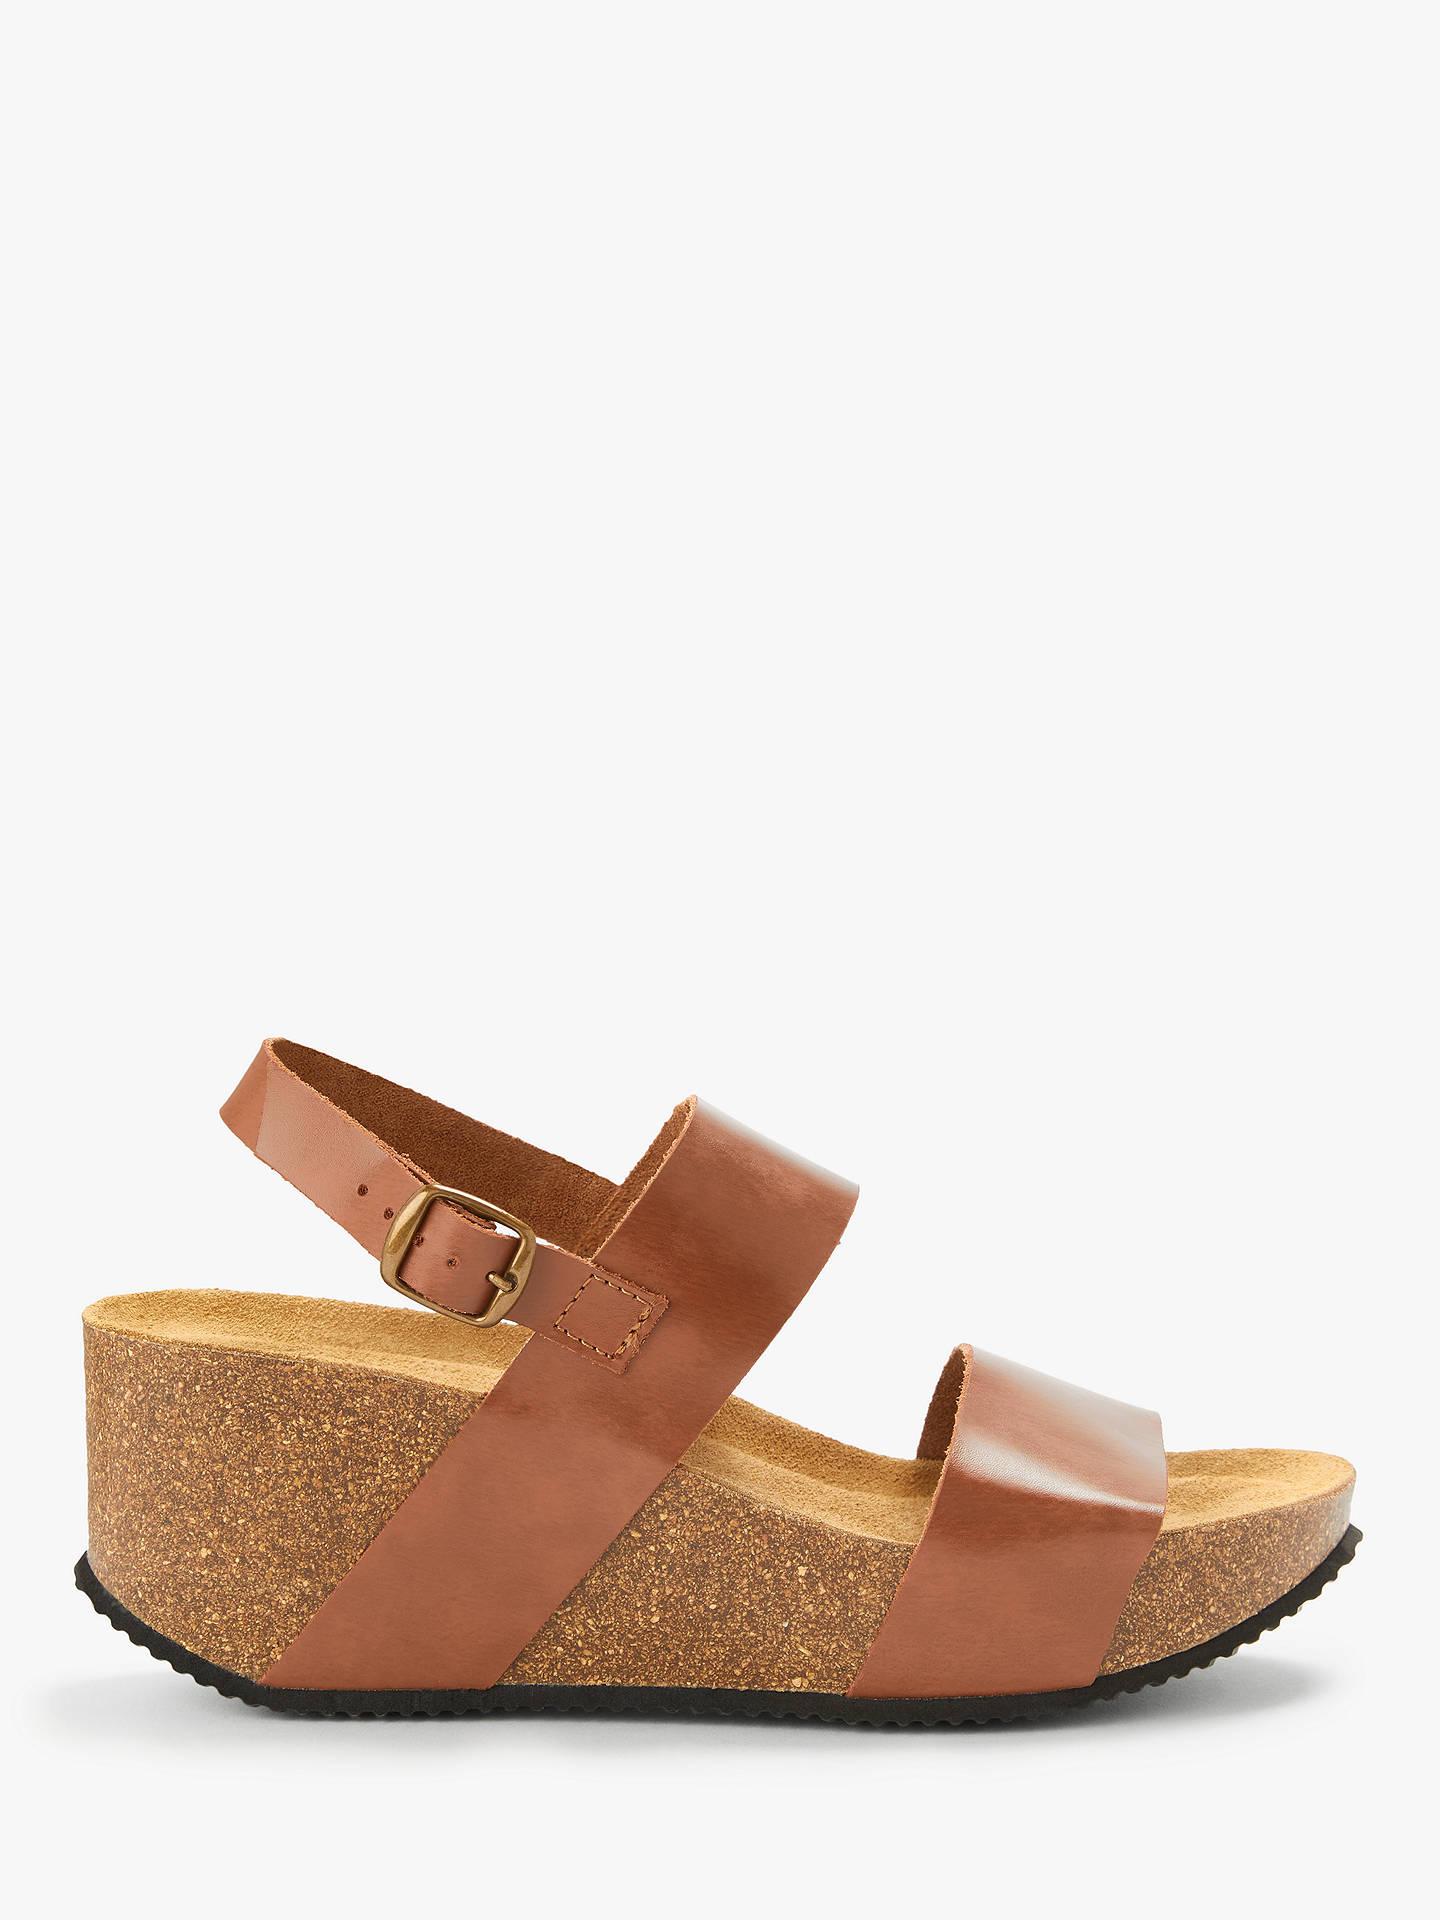 ab67ff8ae0e Kin Kerry Slingback Flatform Sandals at John Lewis   Partners